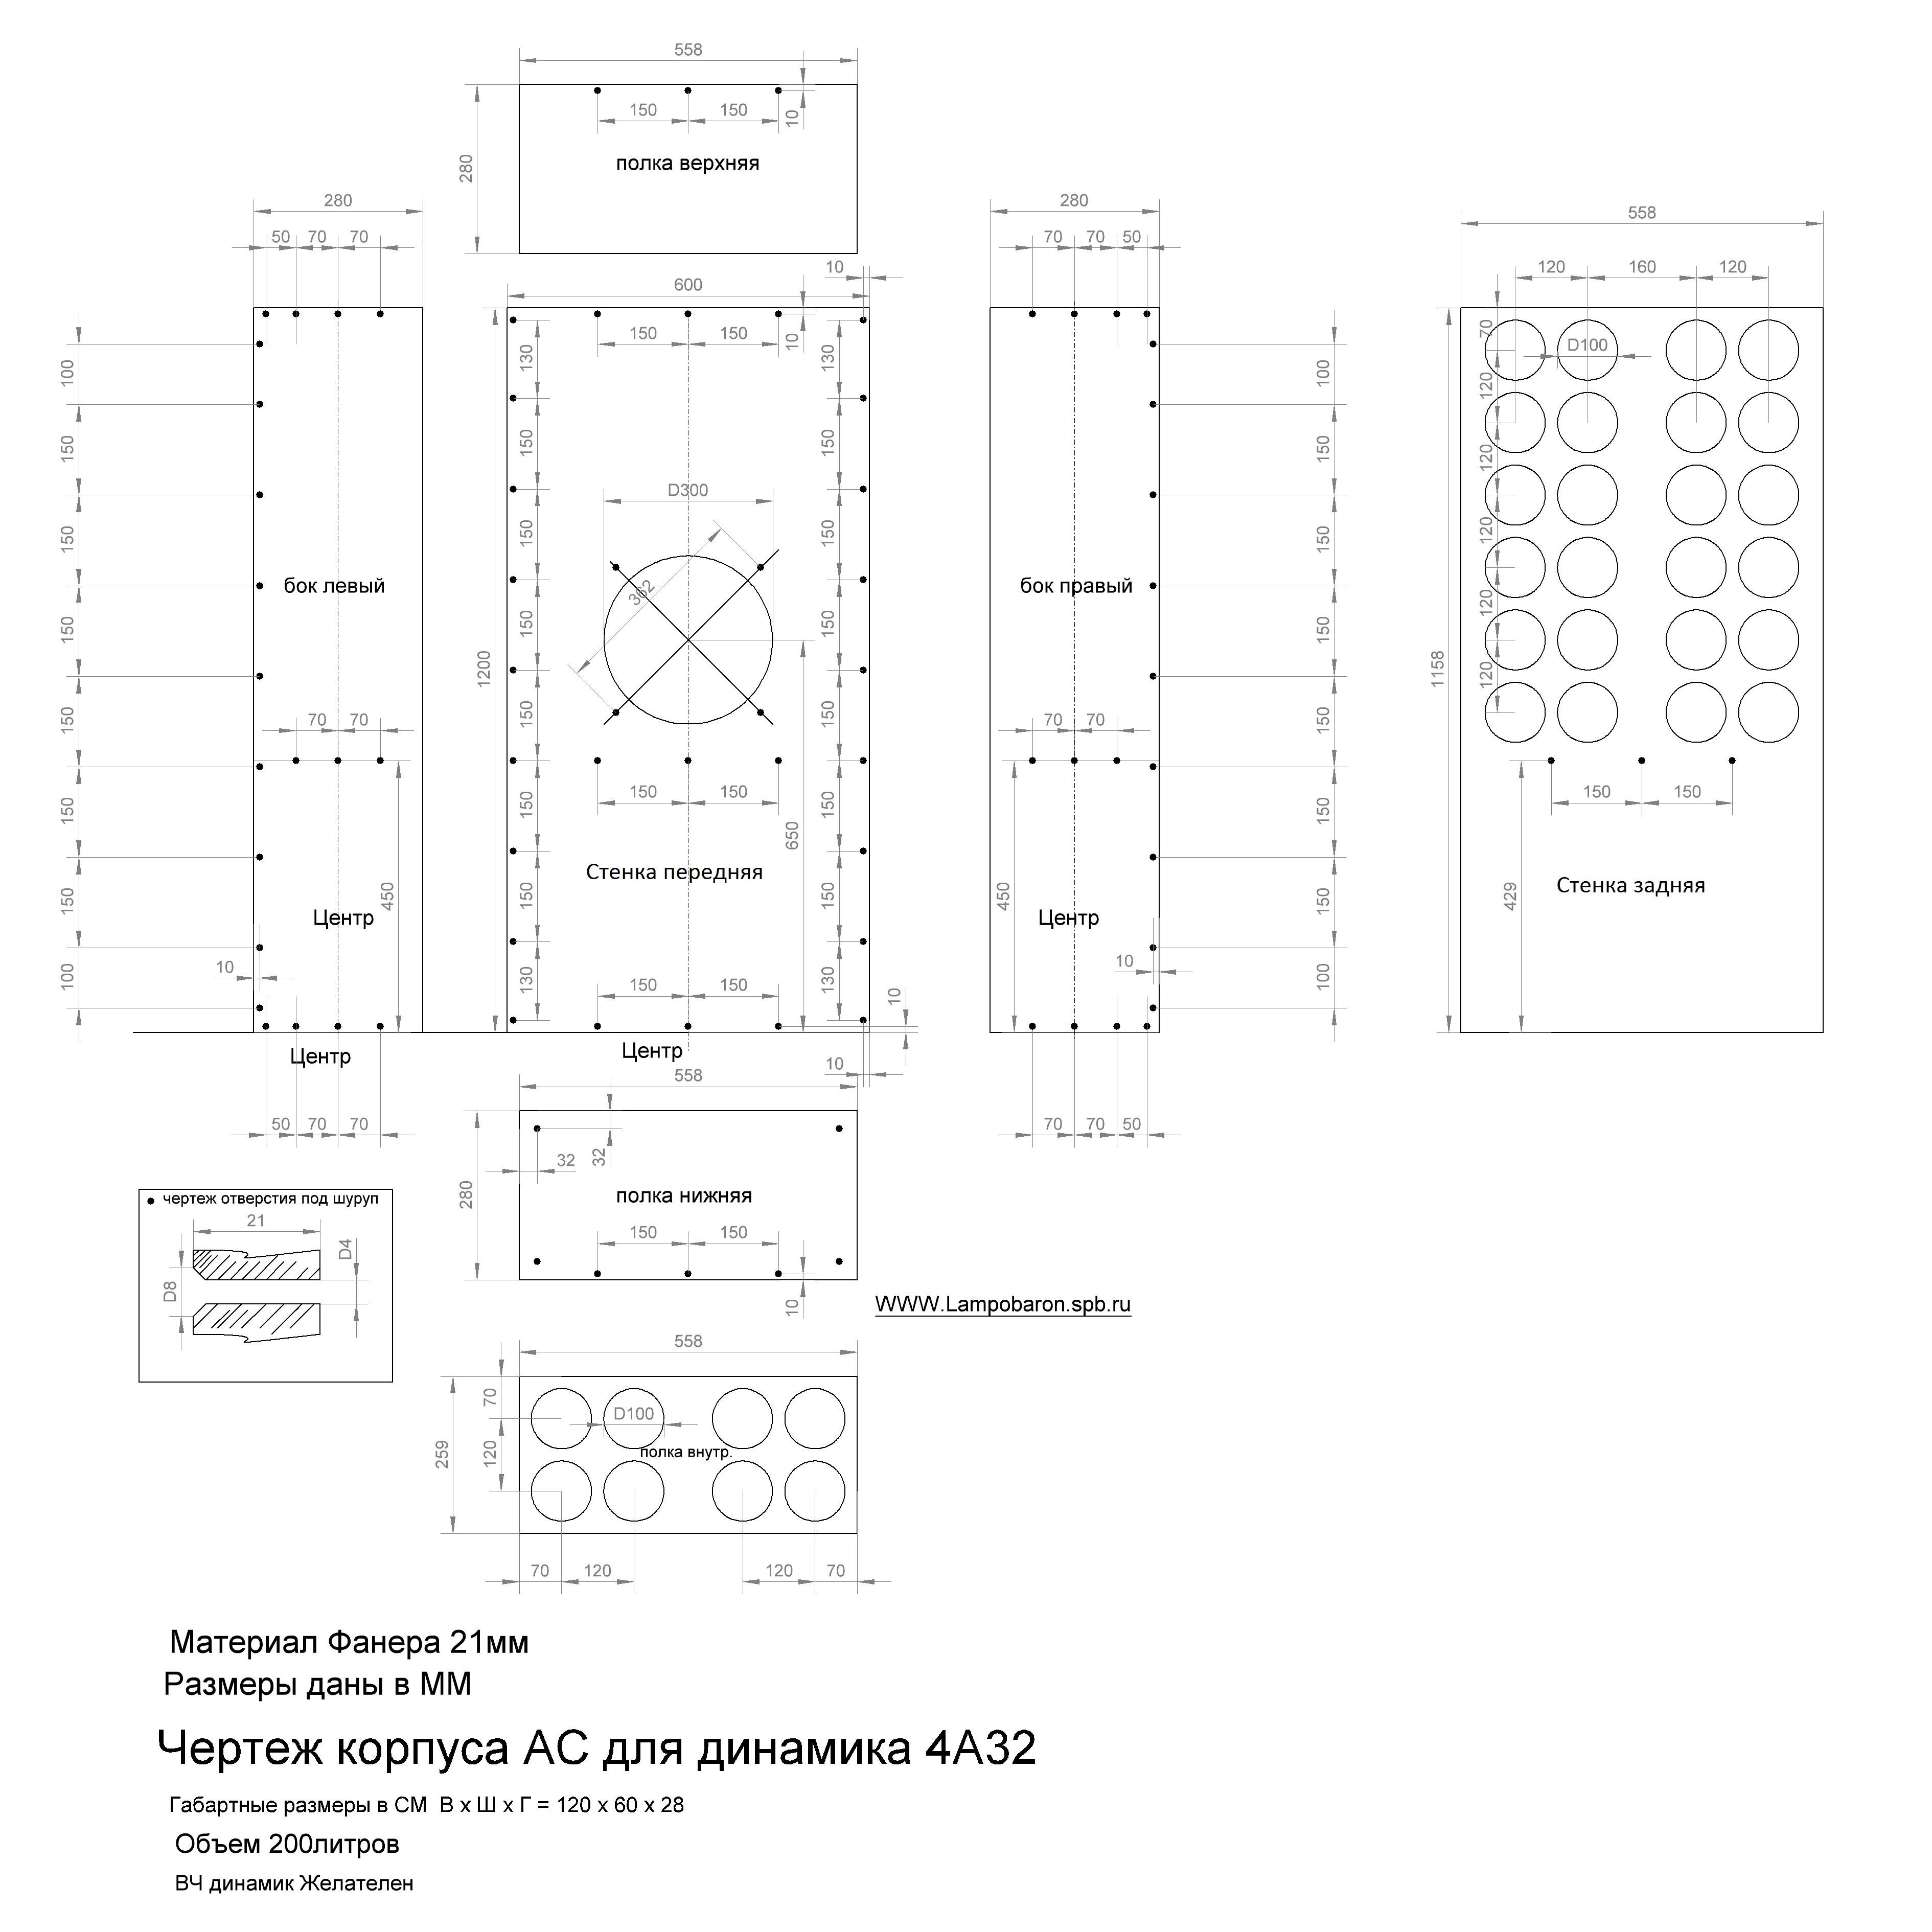 AC_OPEN_AIR_4A32_200_Liter_ZAD_STENKA